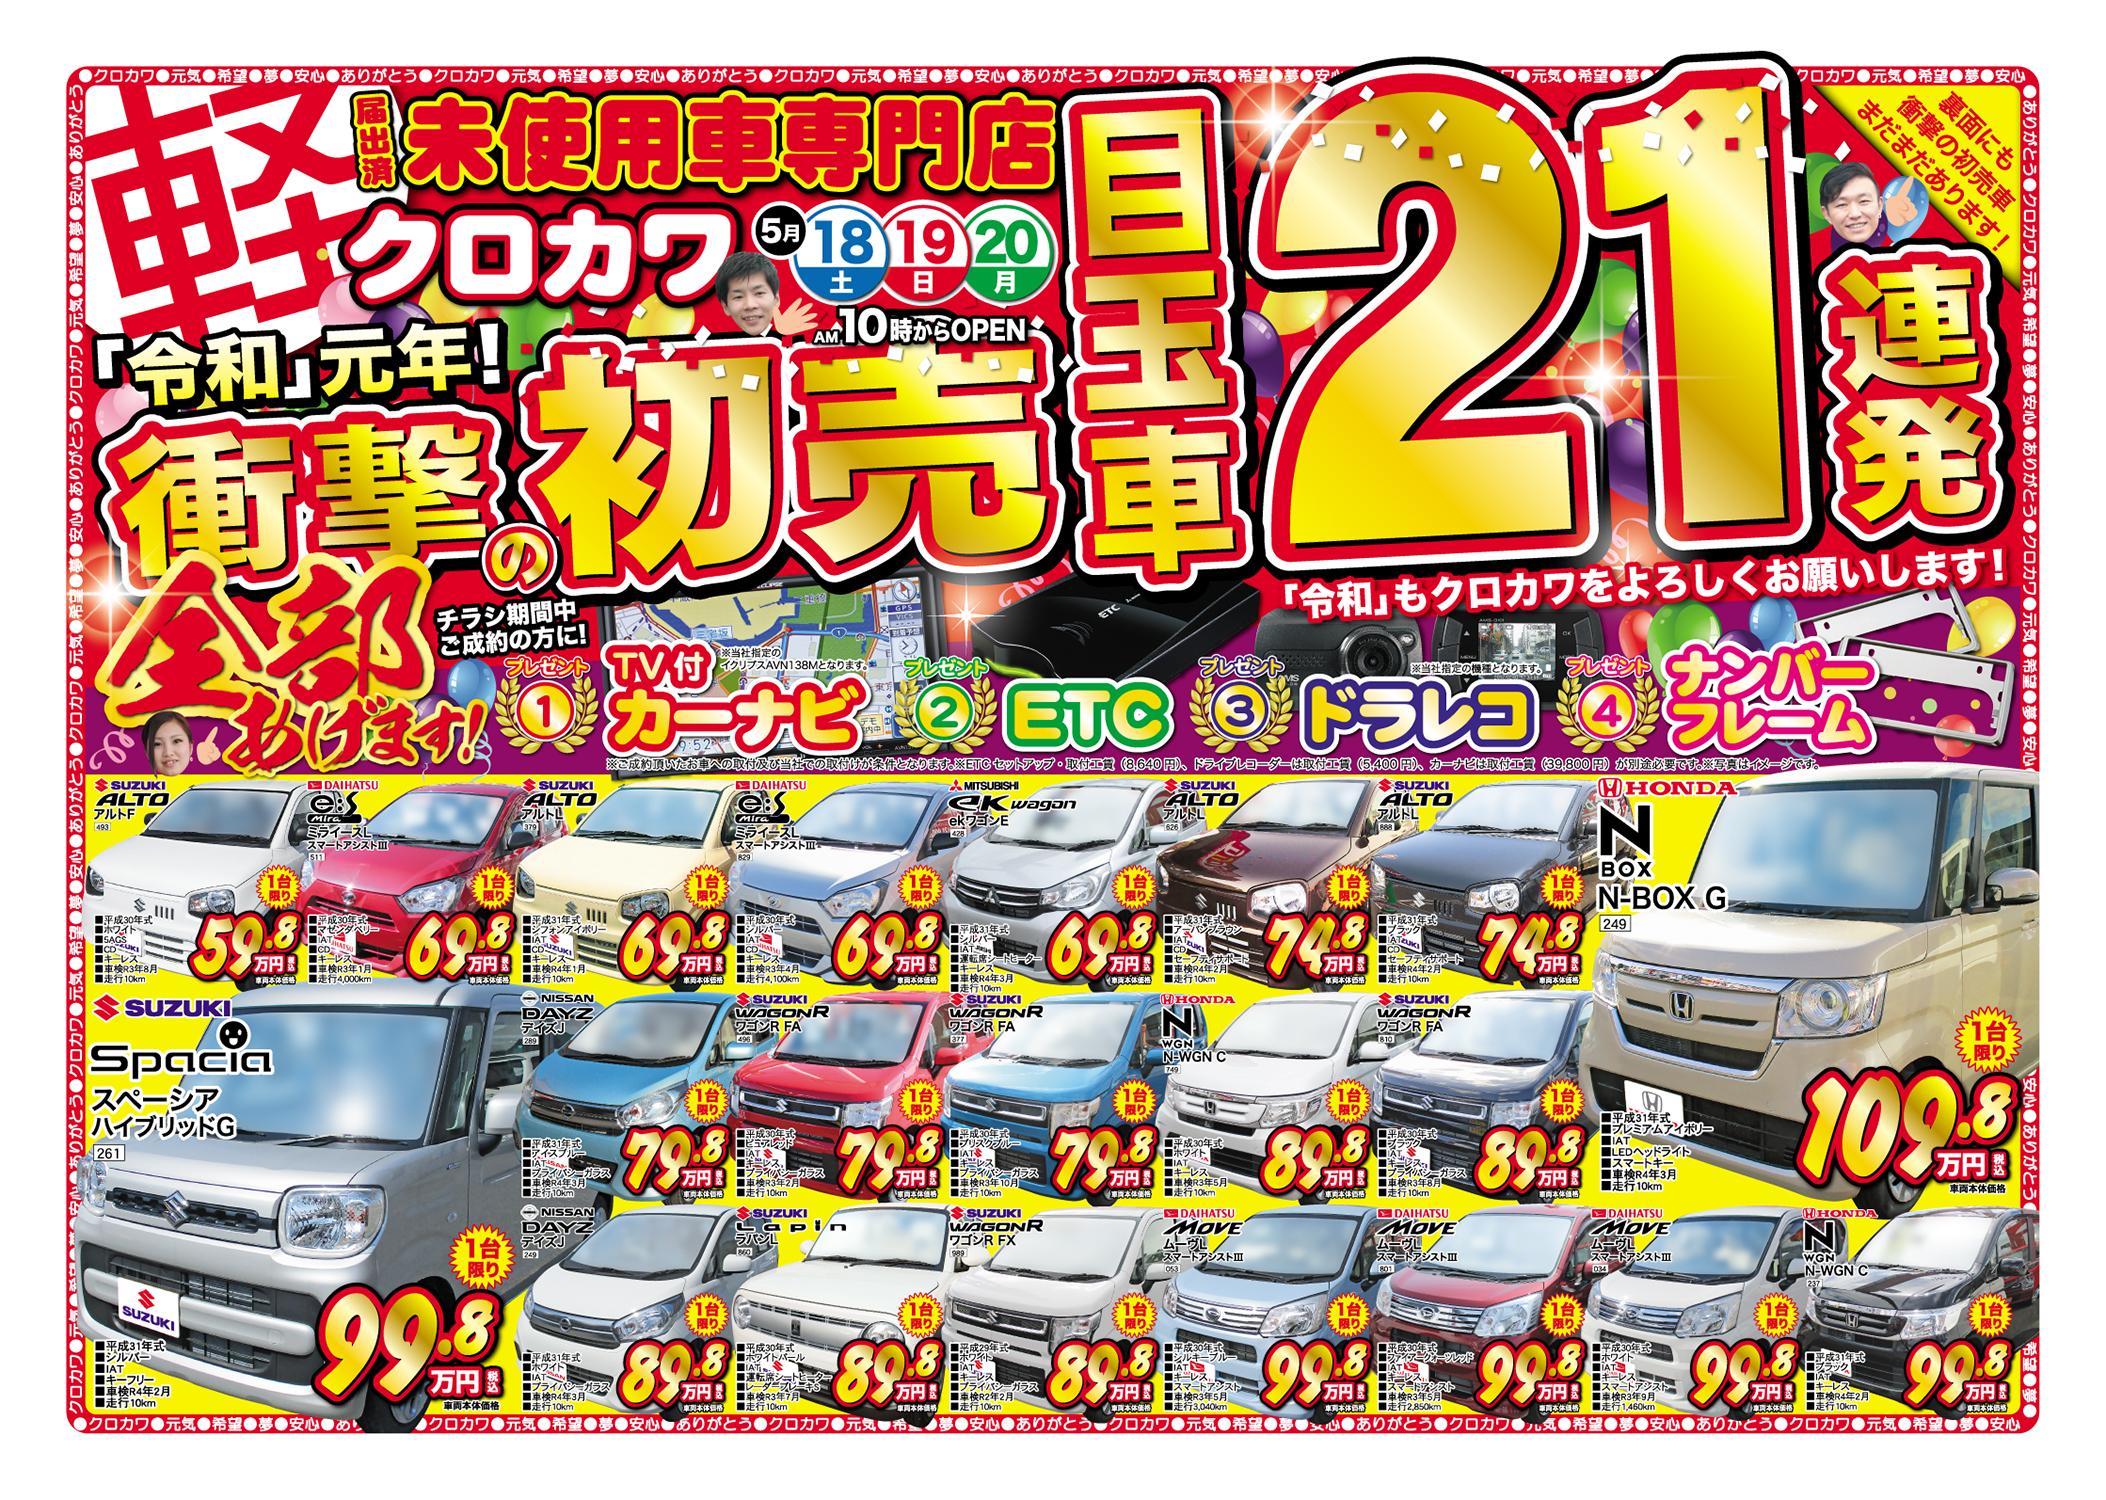 令和元年!衝撃の初売り目玉車21連発!